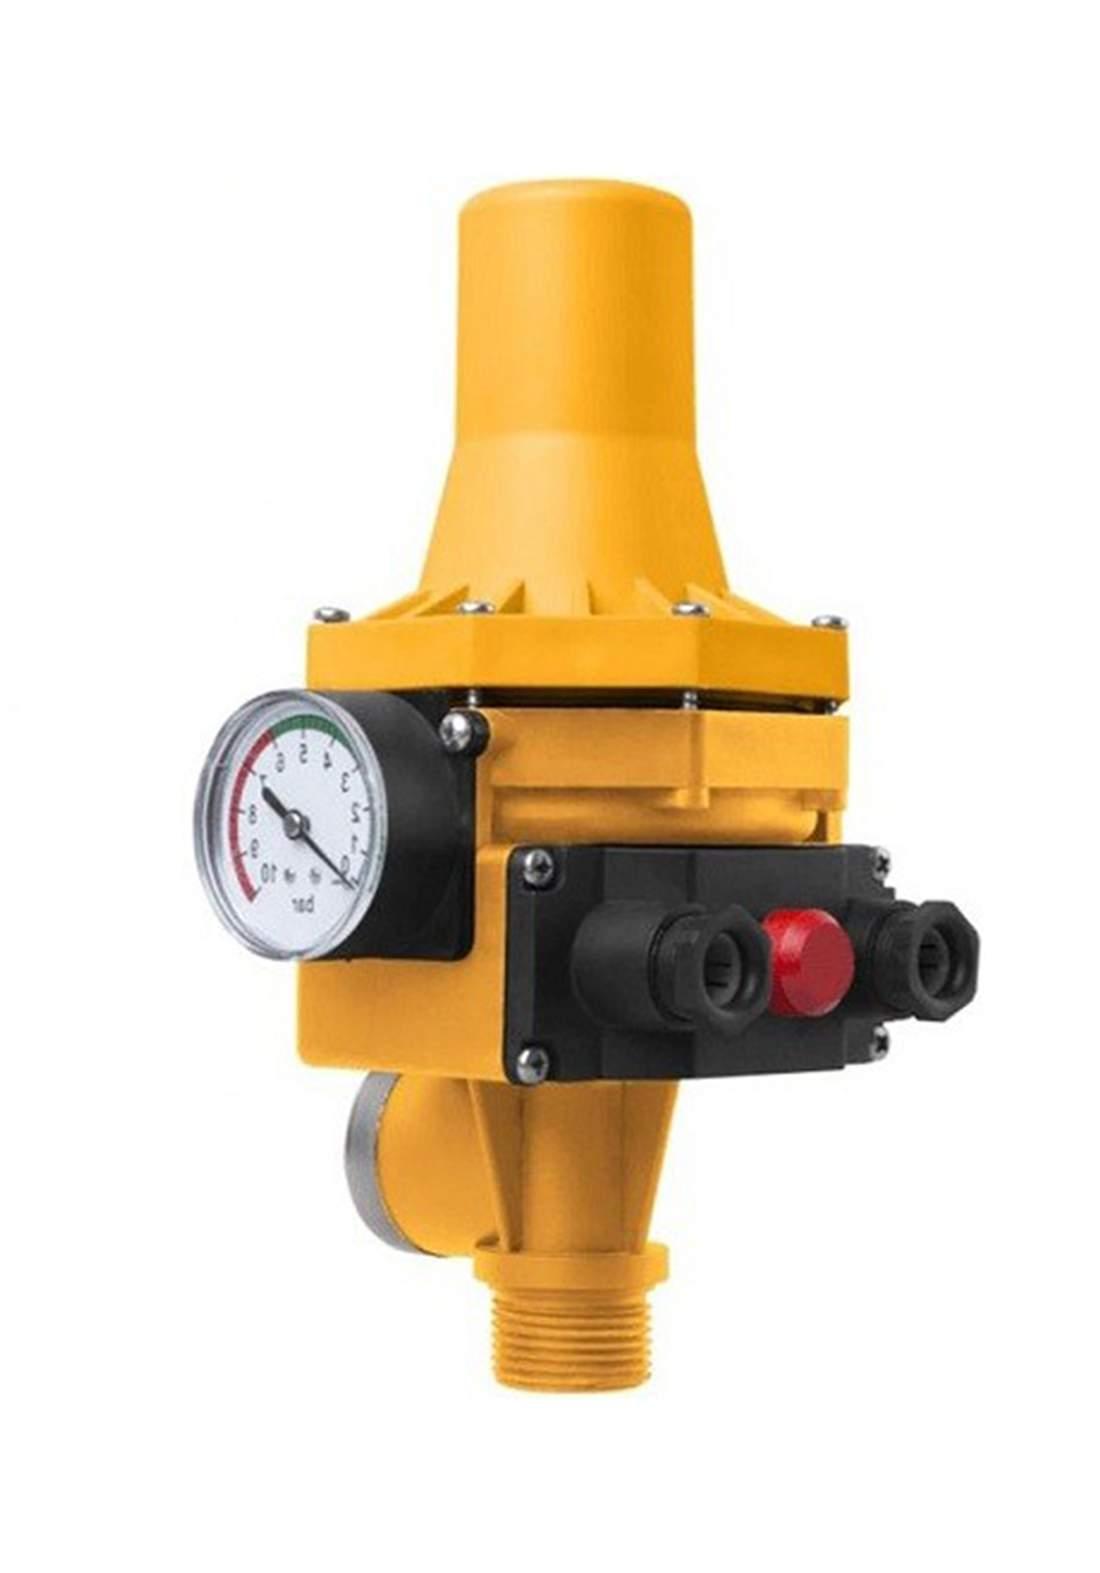 Ingco WAPS002 Automatic Pump Control  مضخة اوتماتيكية